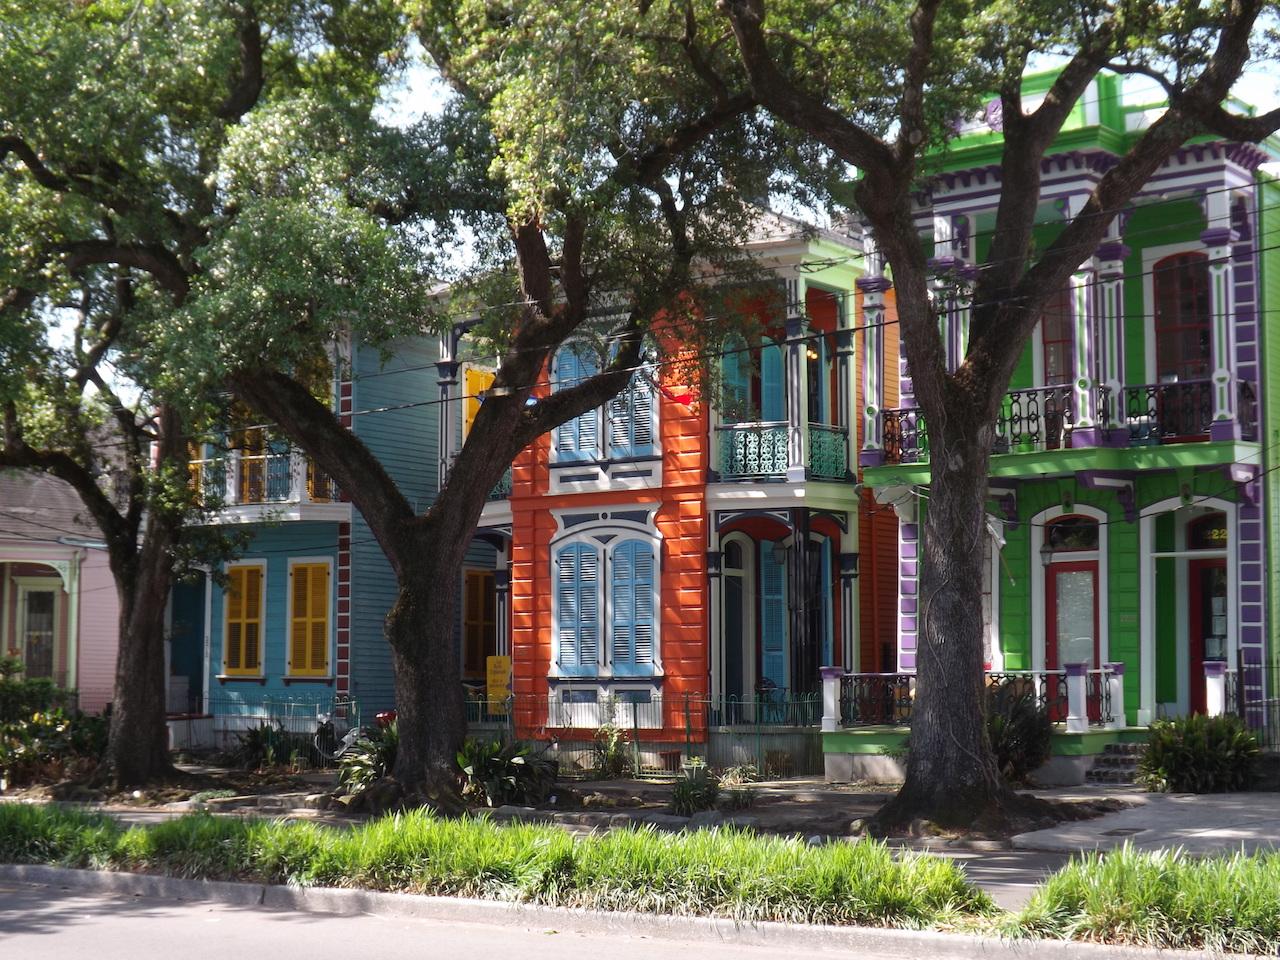 La Belle Esplanade, a small artisanal hotel in America's most interesting city